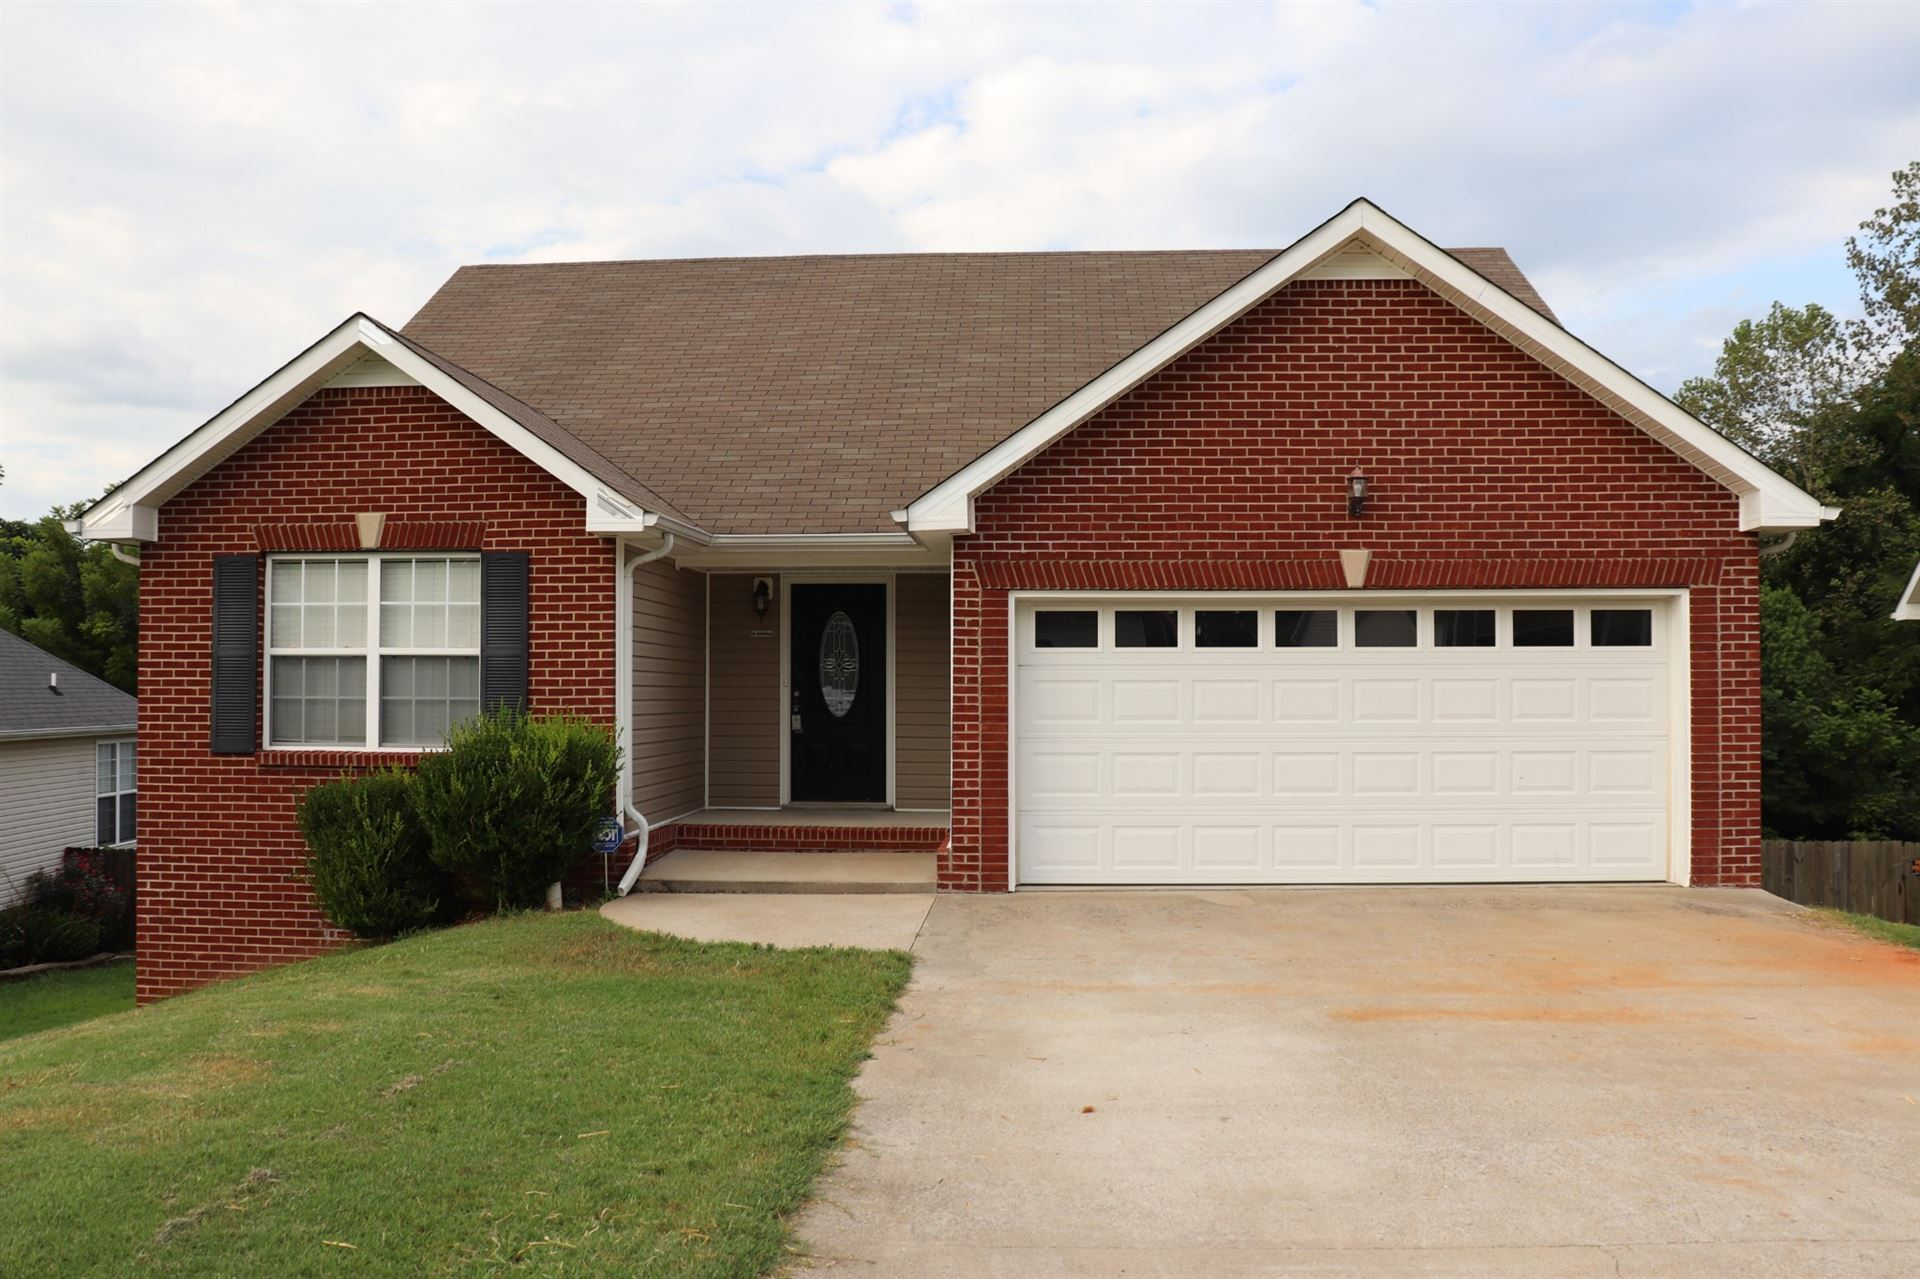 1509 Tylertown Rd, Clarksville, TN 37040 - MLS#: 2297853